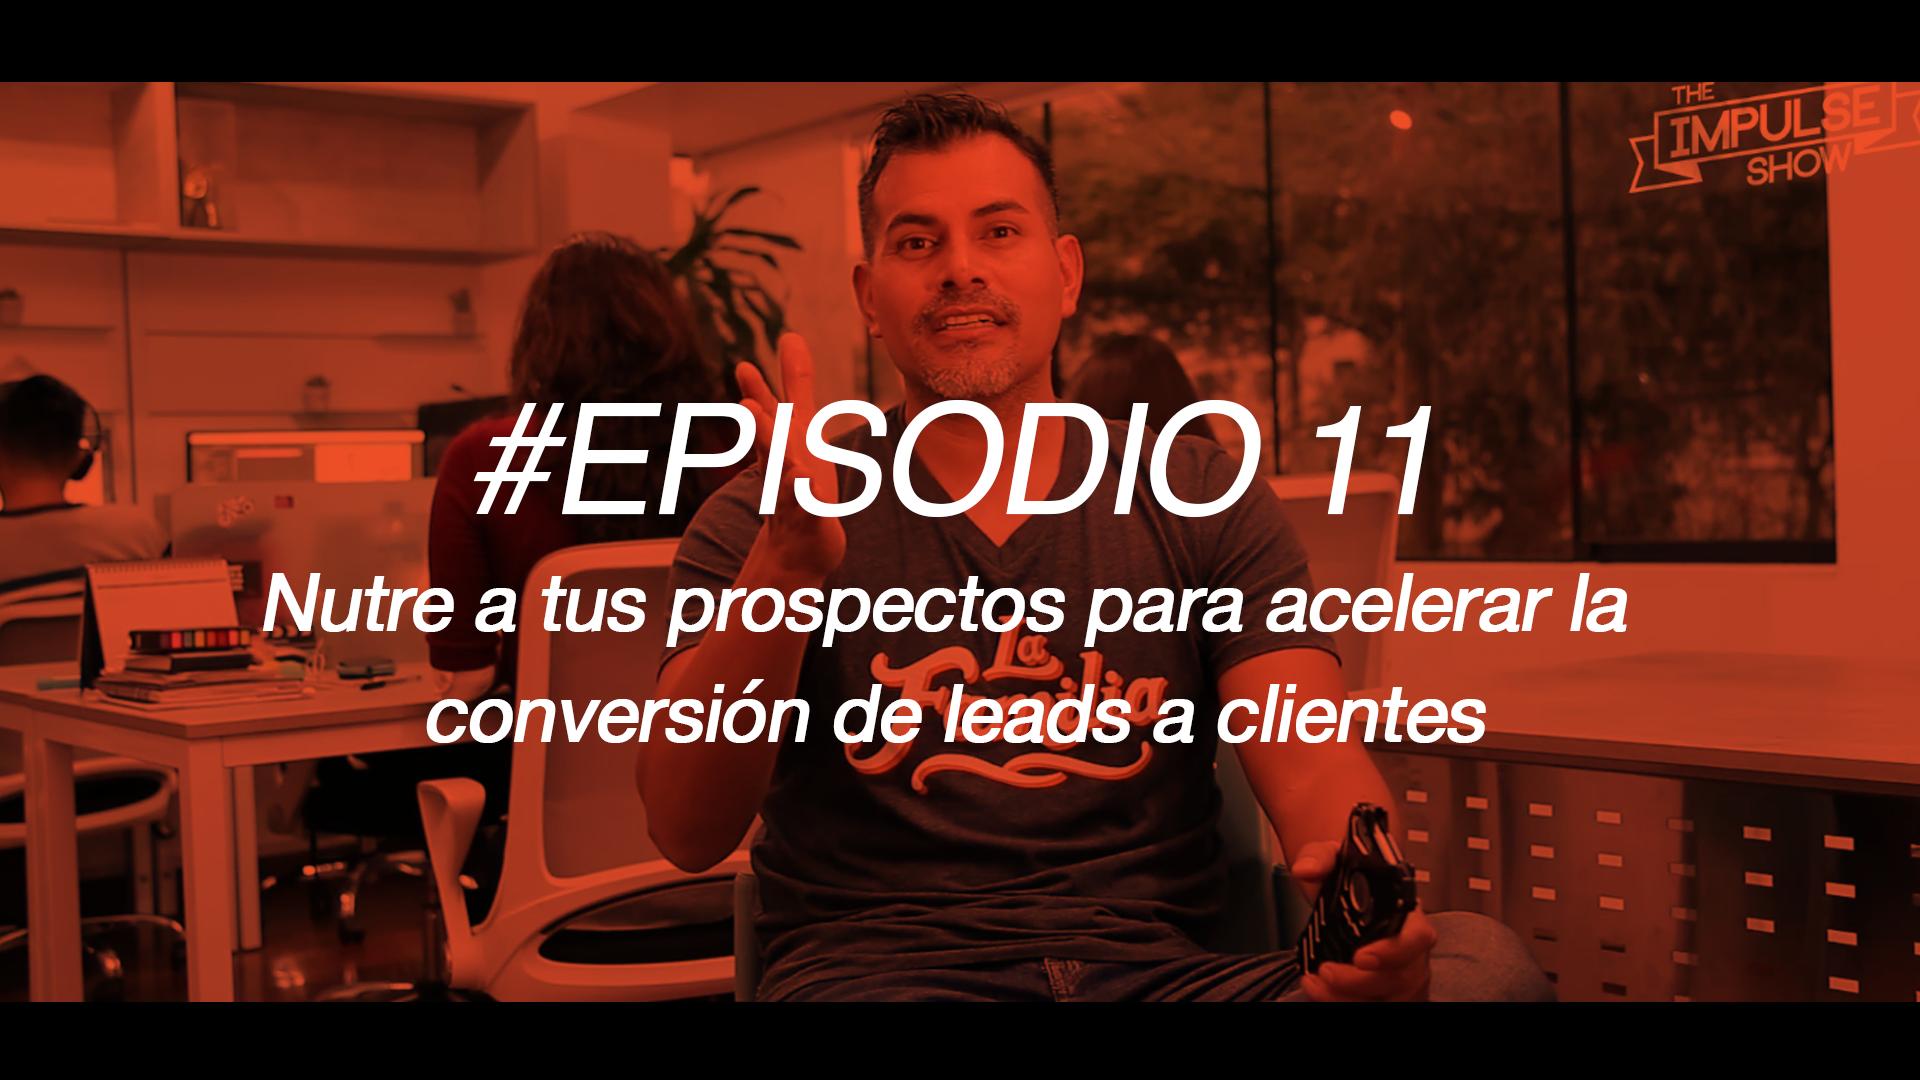 #TheImpulseShow Ep 11: Estrategias efectivas de nutrición de prospectos